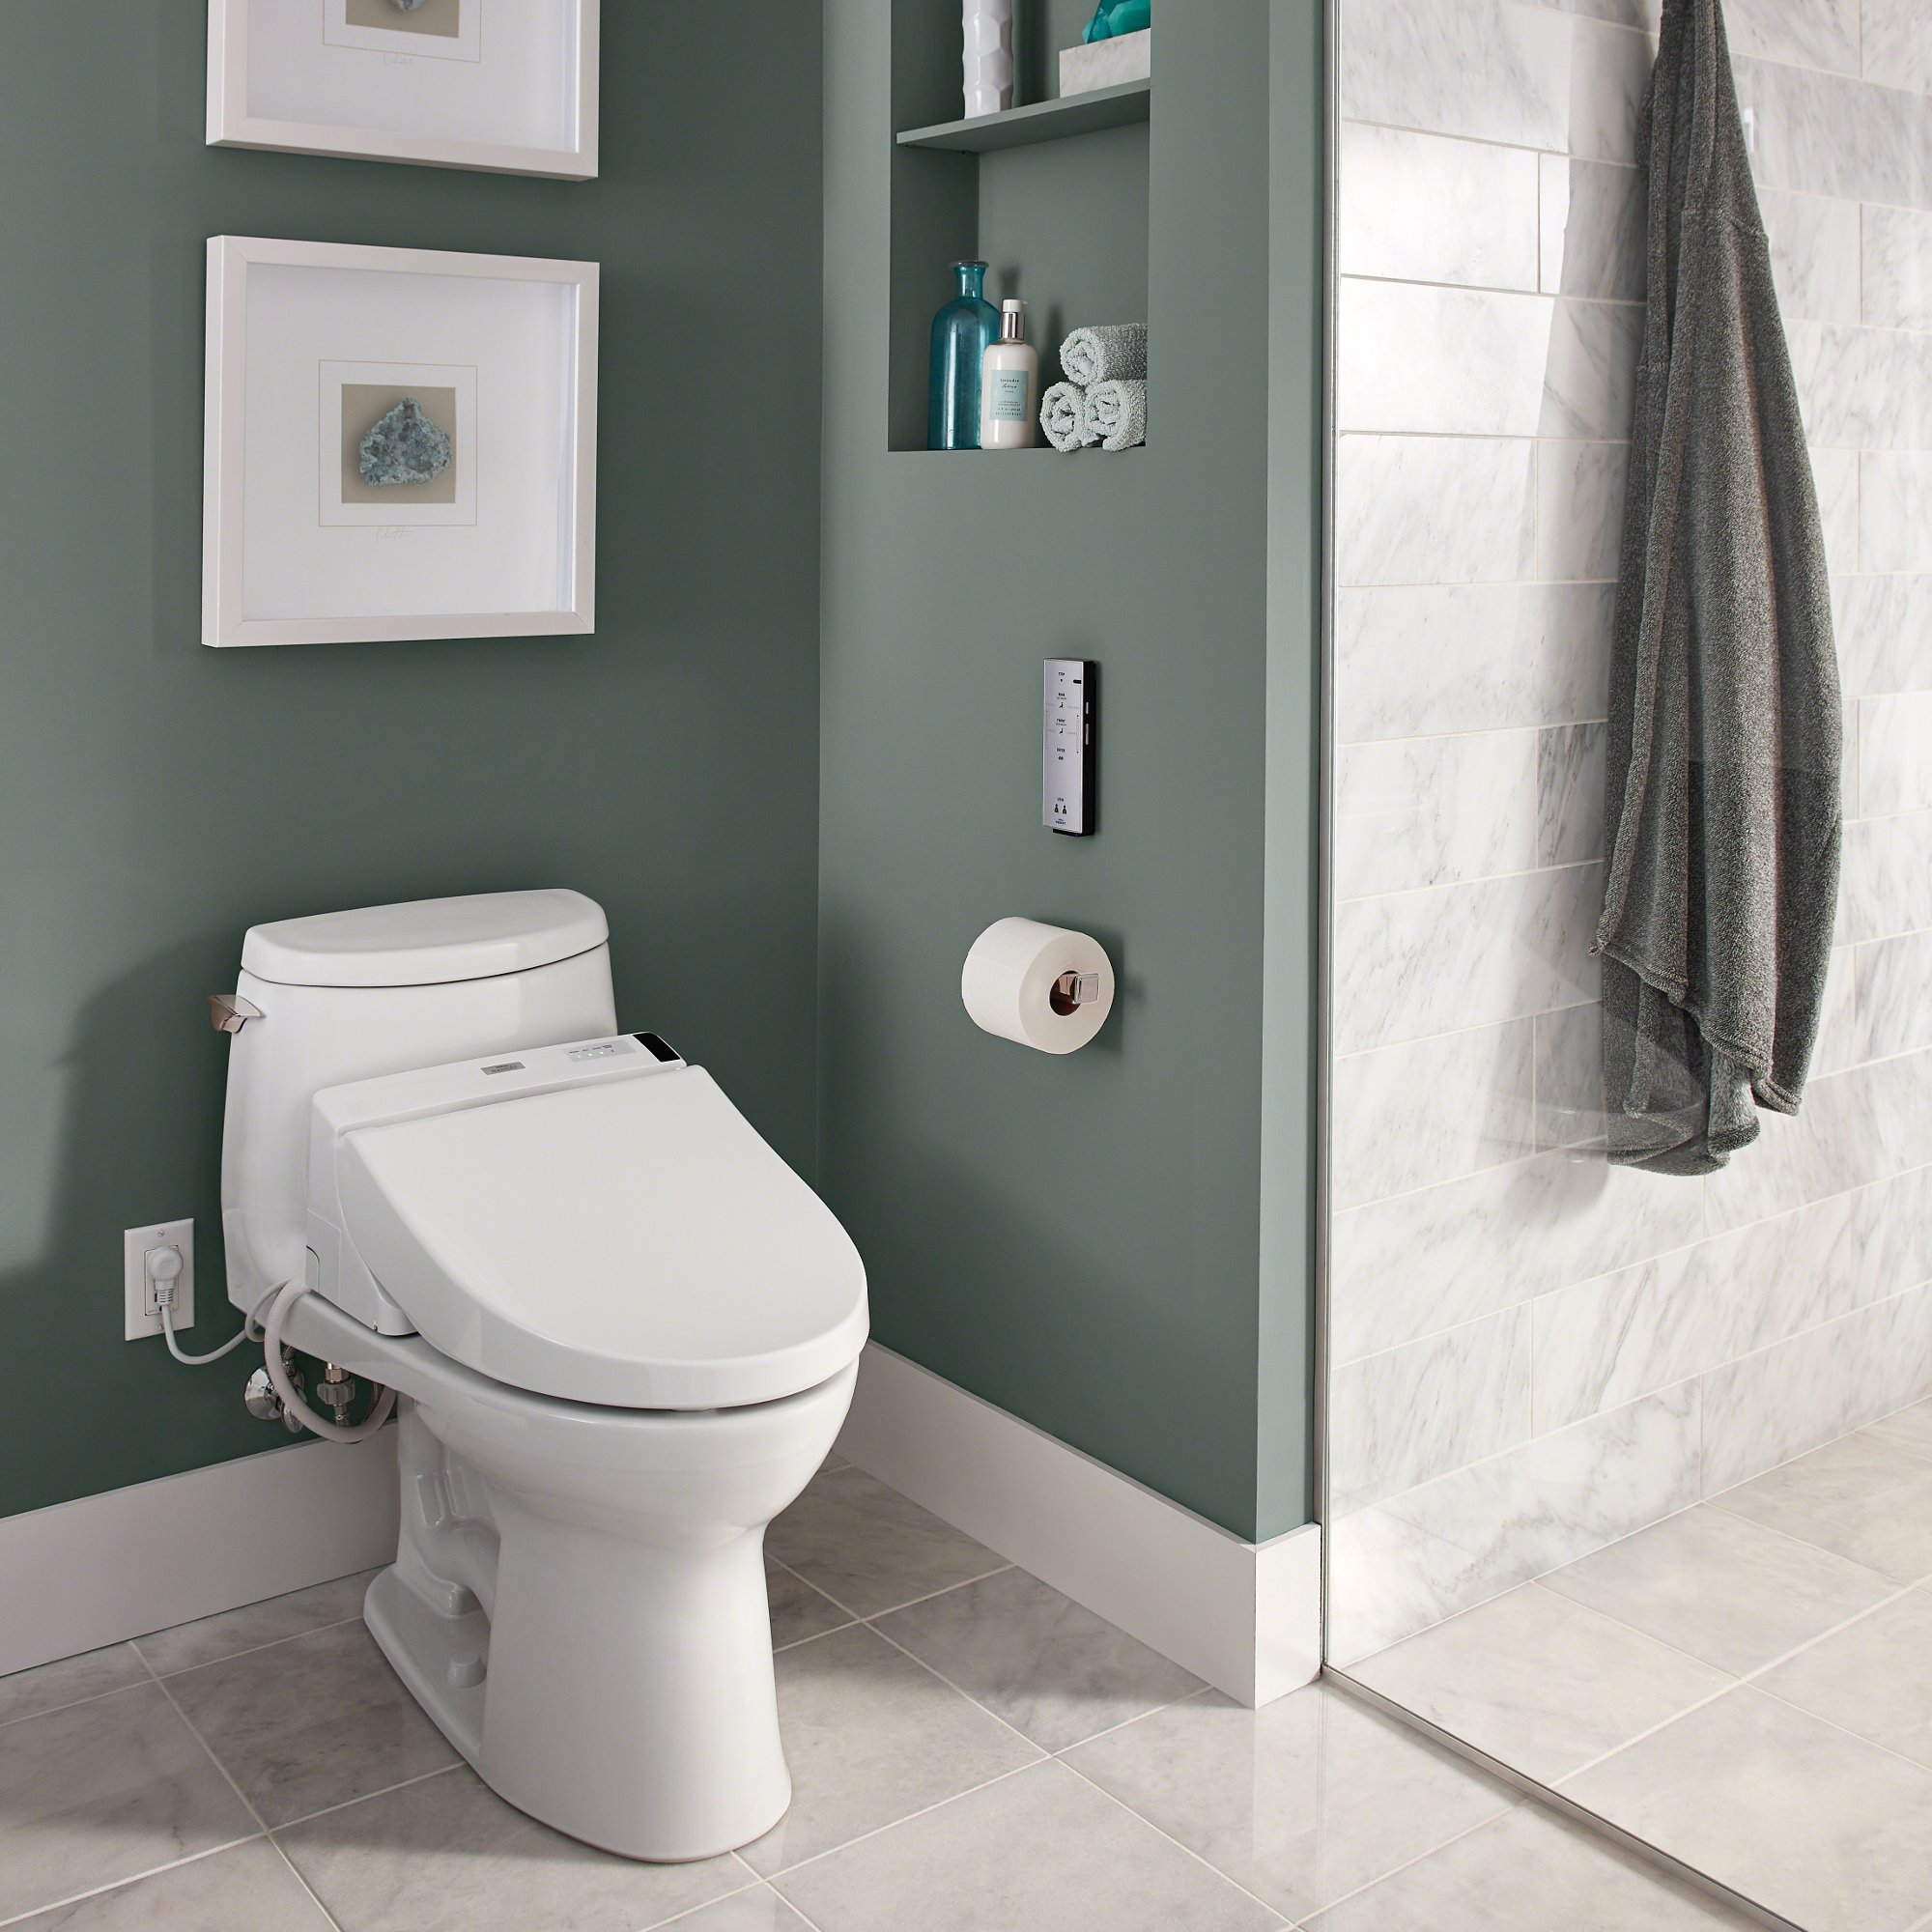 TOTO Washlet C200 Elongated Bidet Toilet Seat with PreMist, Cotton White - SW2044#01 by TOTO (Image #8)